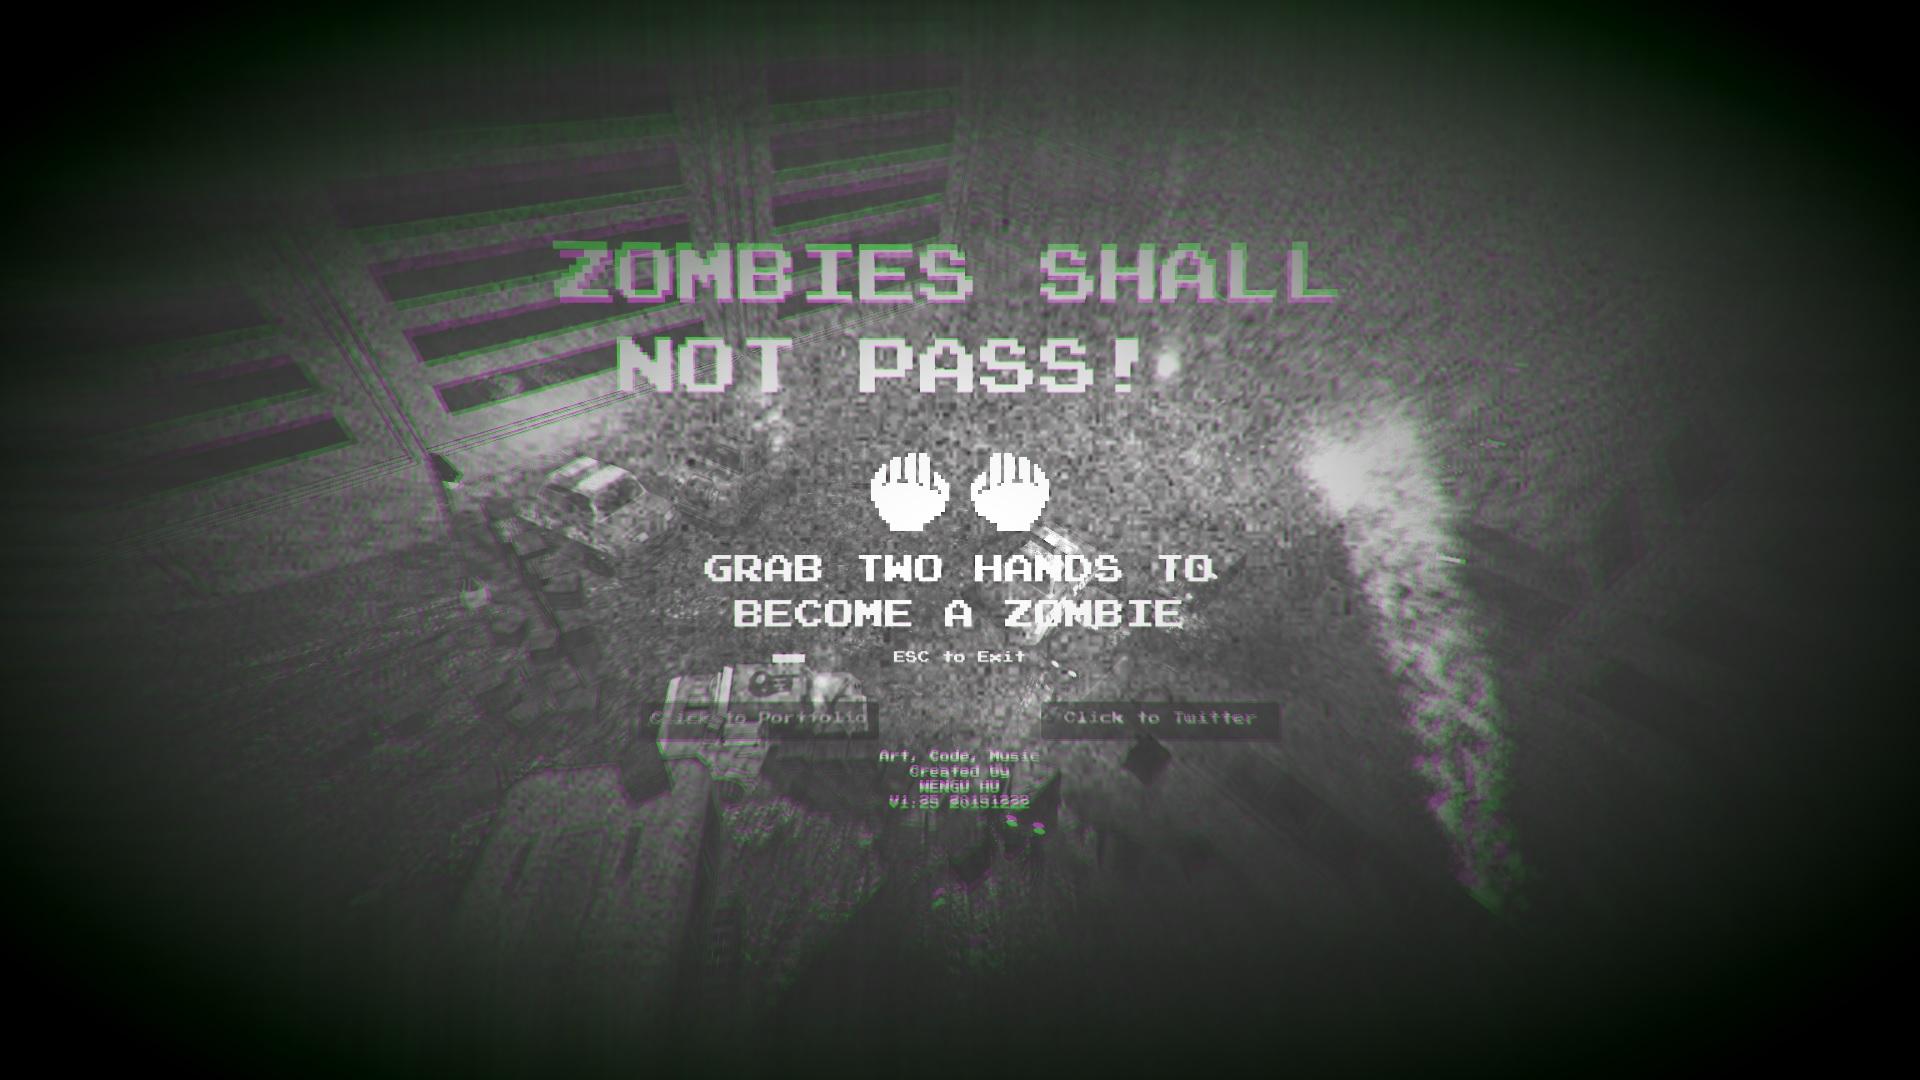 Still image from  Zombie Shall Not Pass! . © Wengu Hu